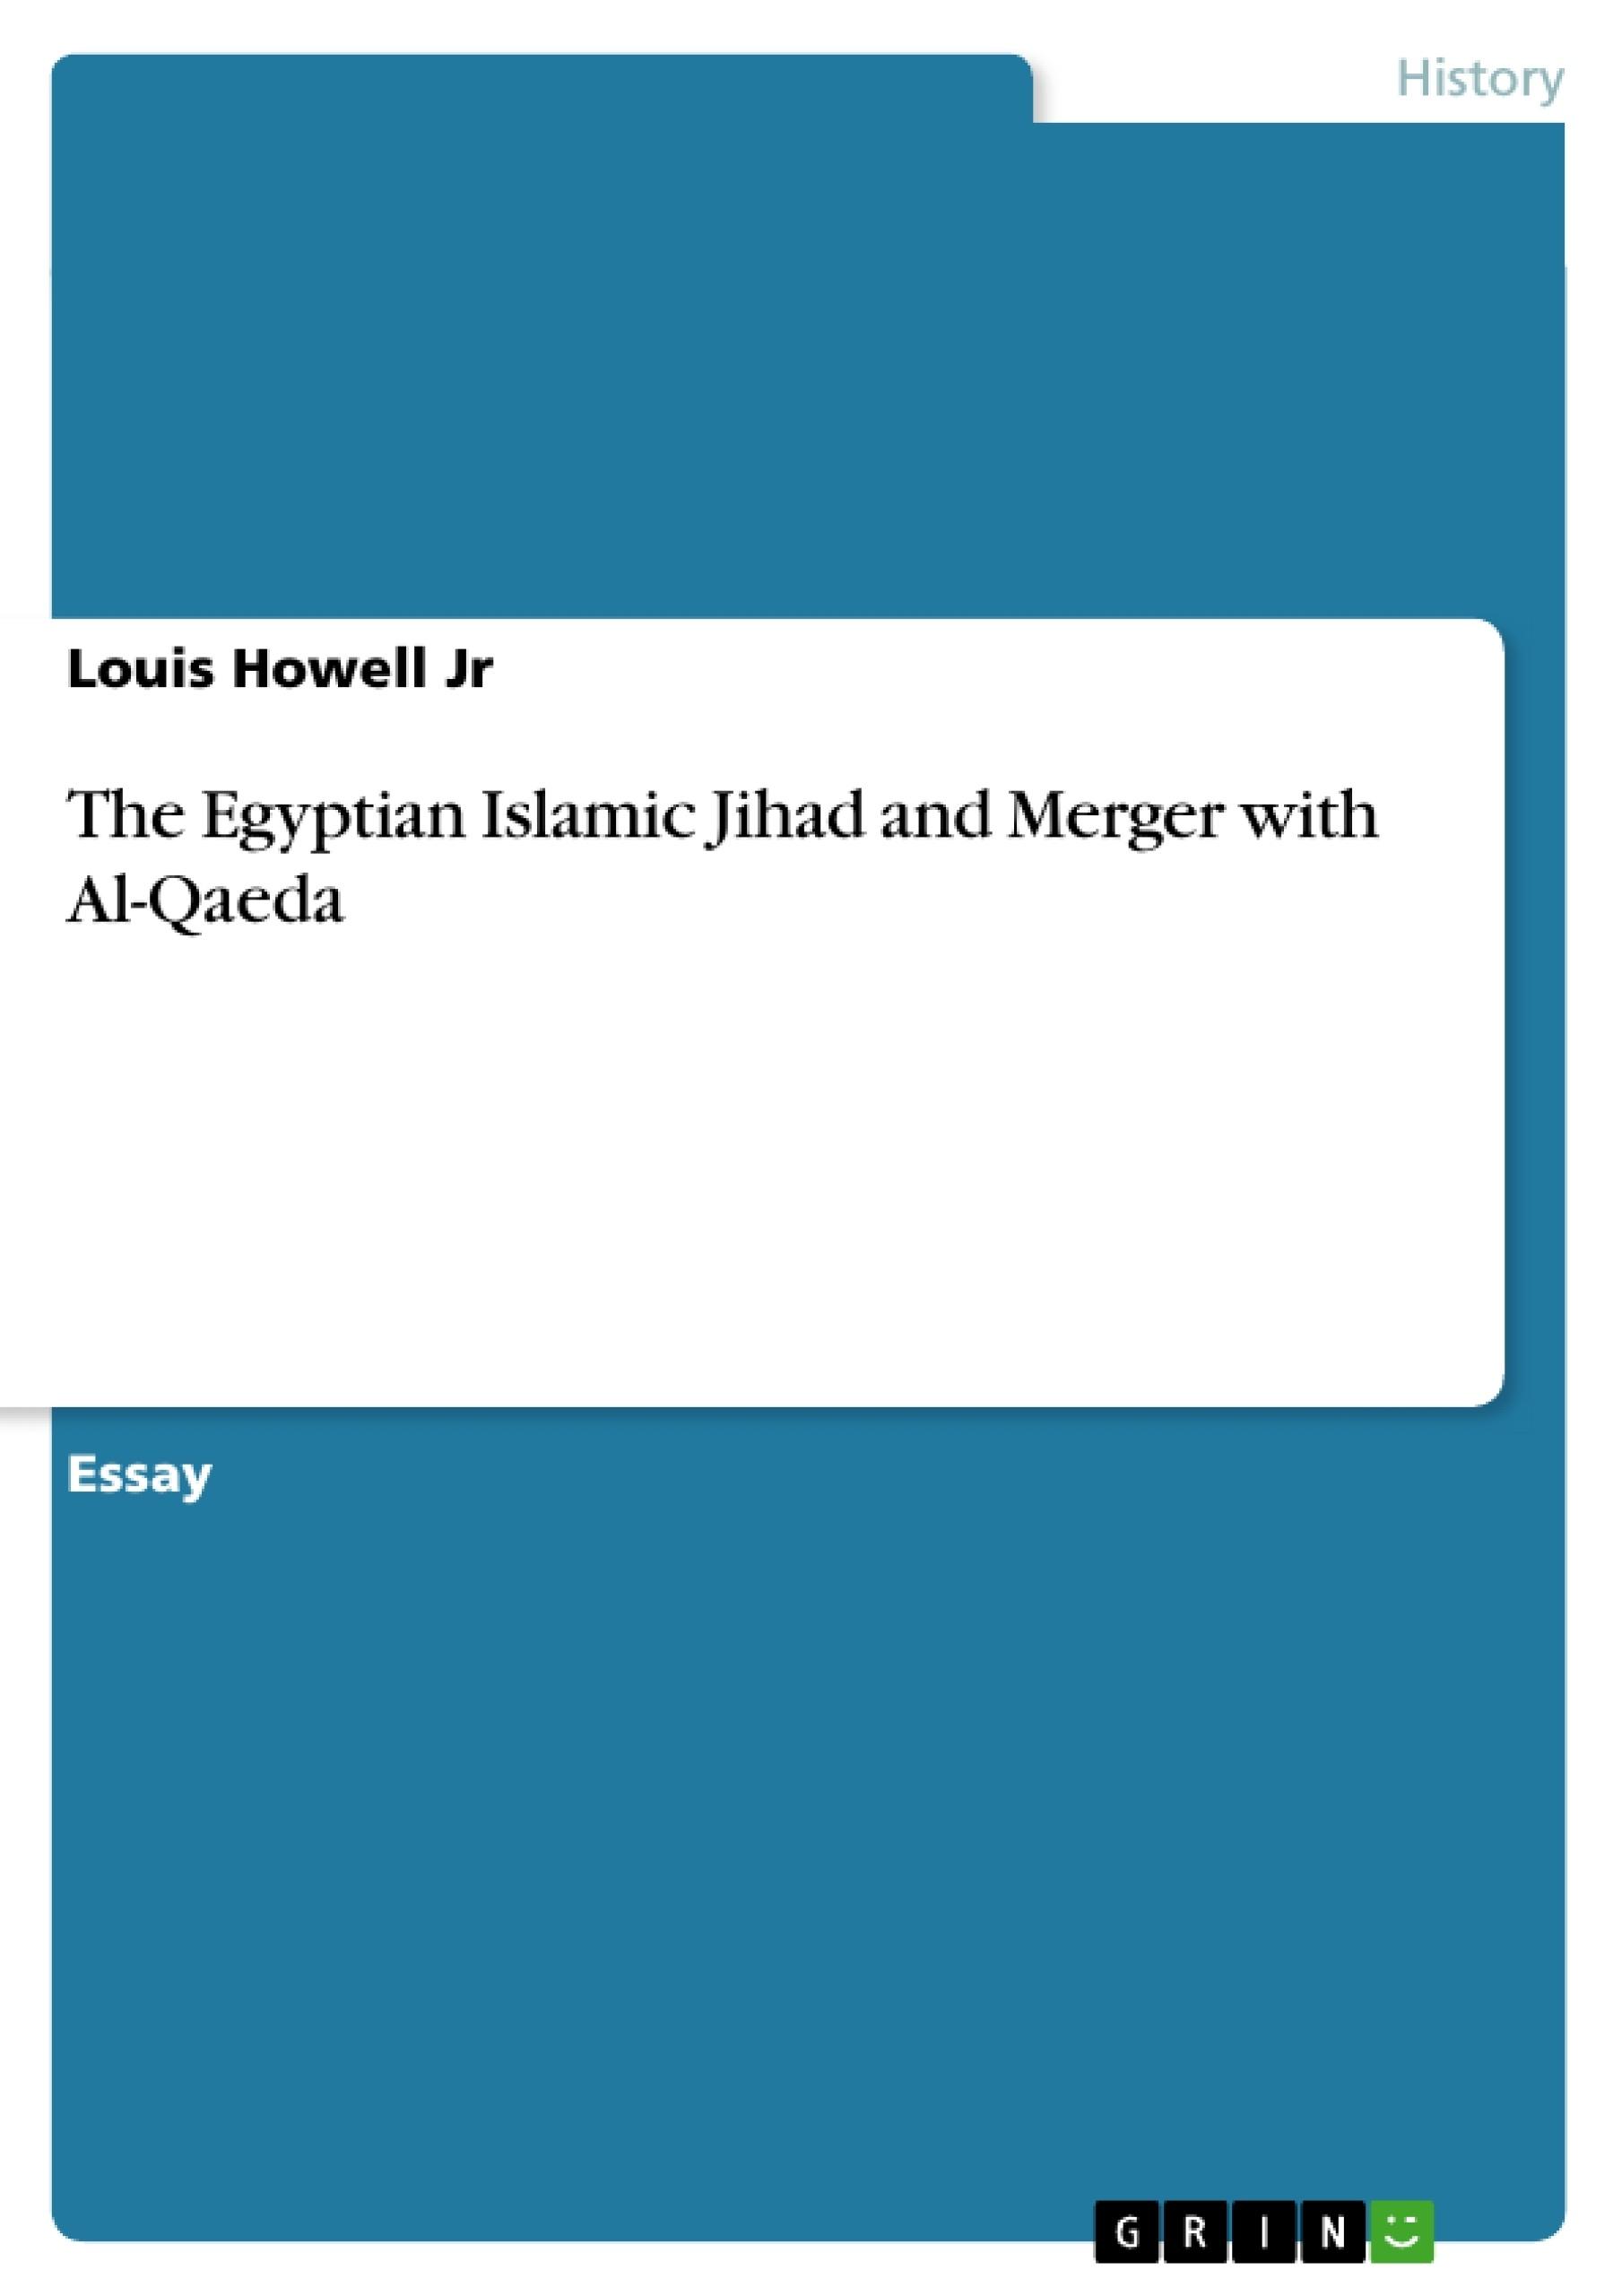 Title: The Egyptian Islamic Jihad and Merger with Al-Qaeda